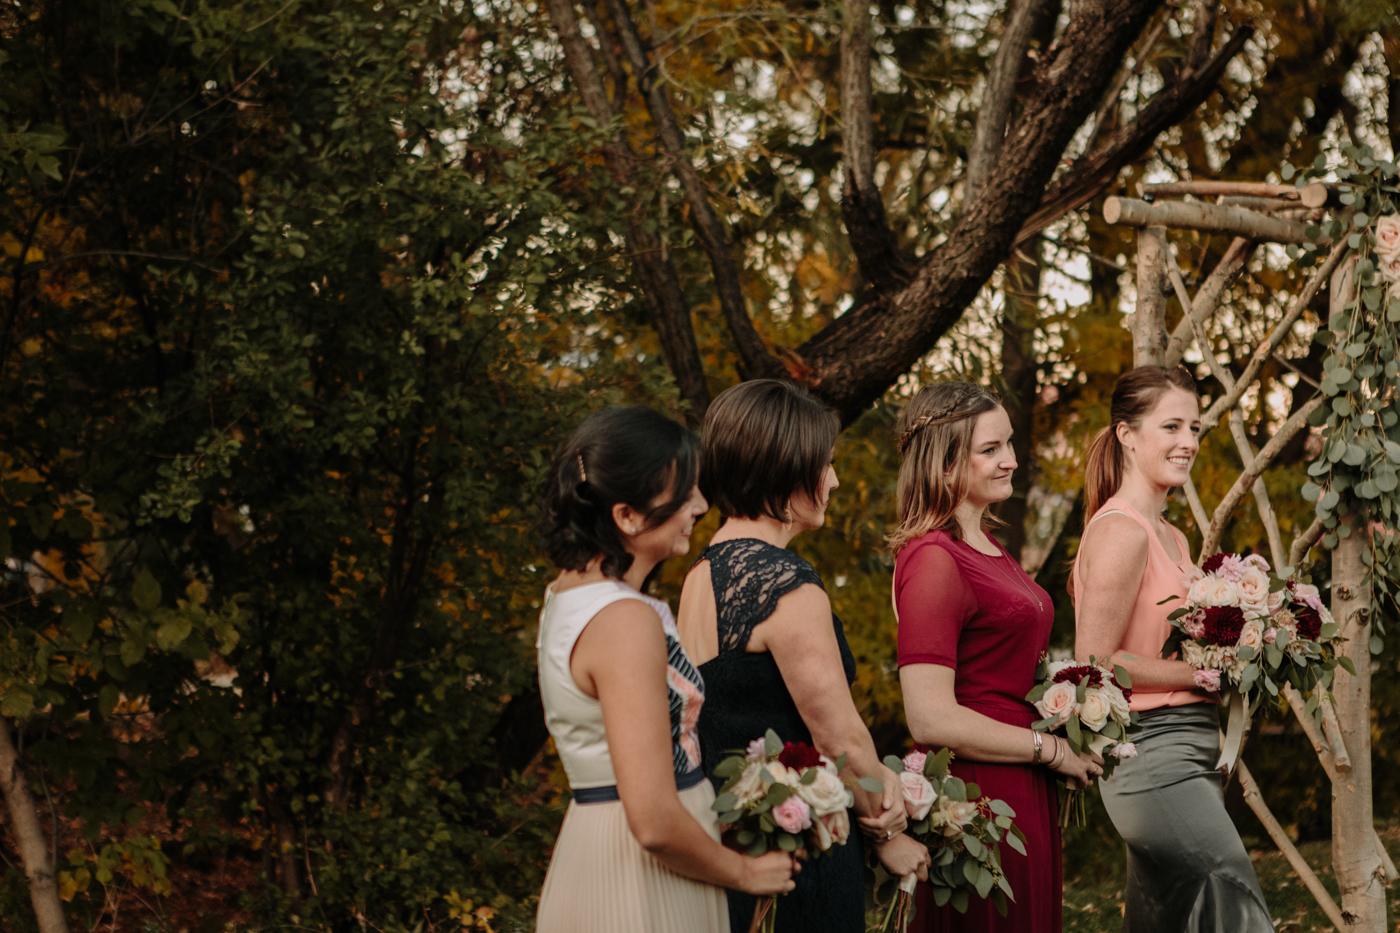 boulder-museum-modern-art-colorado-wedding-50.jpg